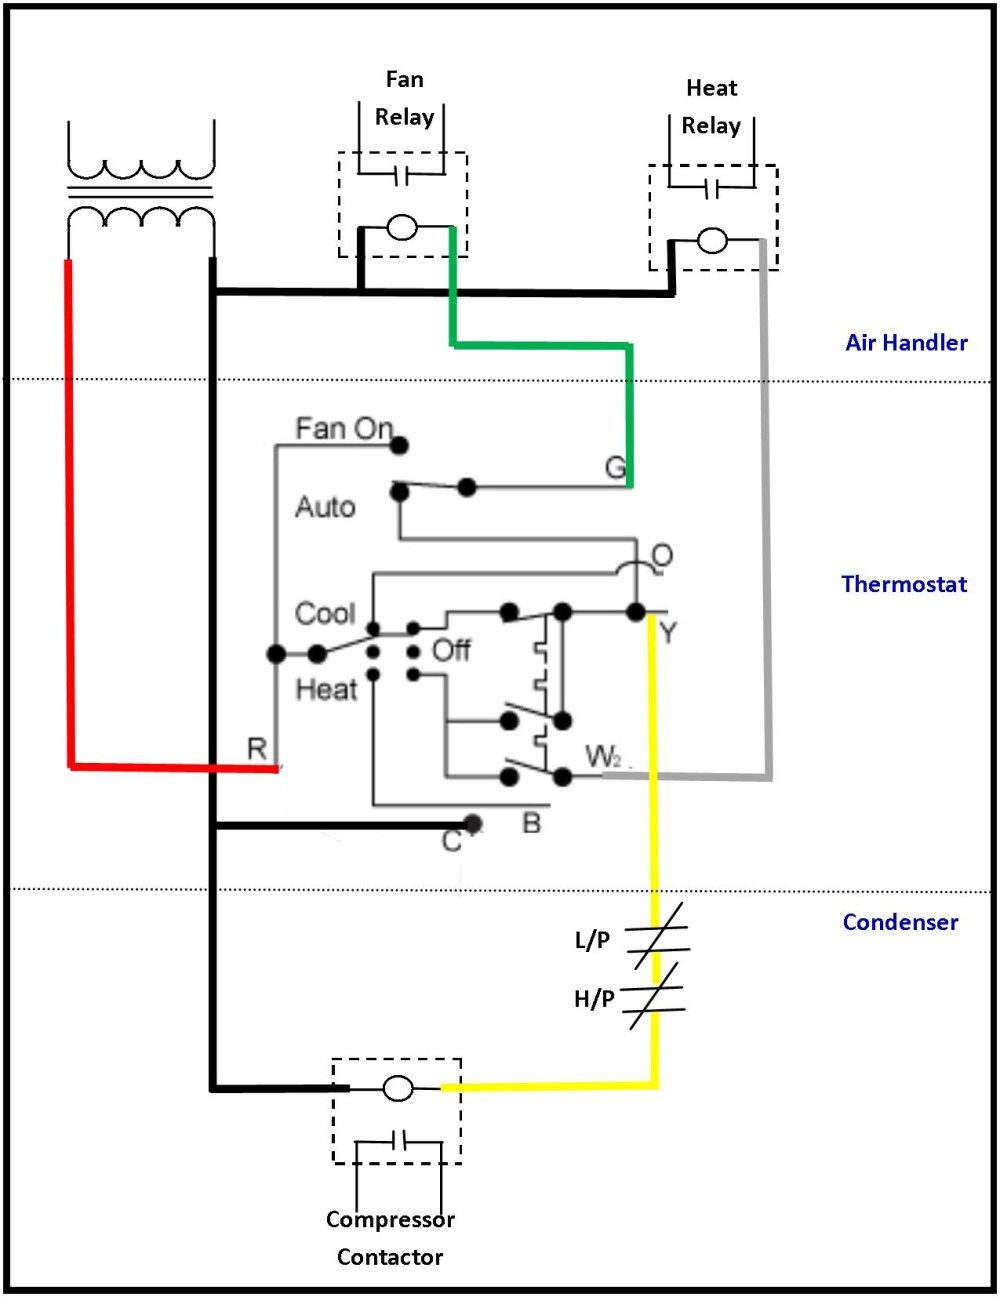 medium resolution of 480 volt transformers wiring diagrams wiring library 480 volt to 120 volt transformer wiring diagram download